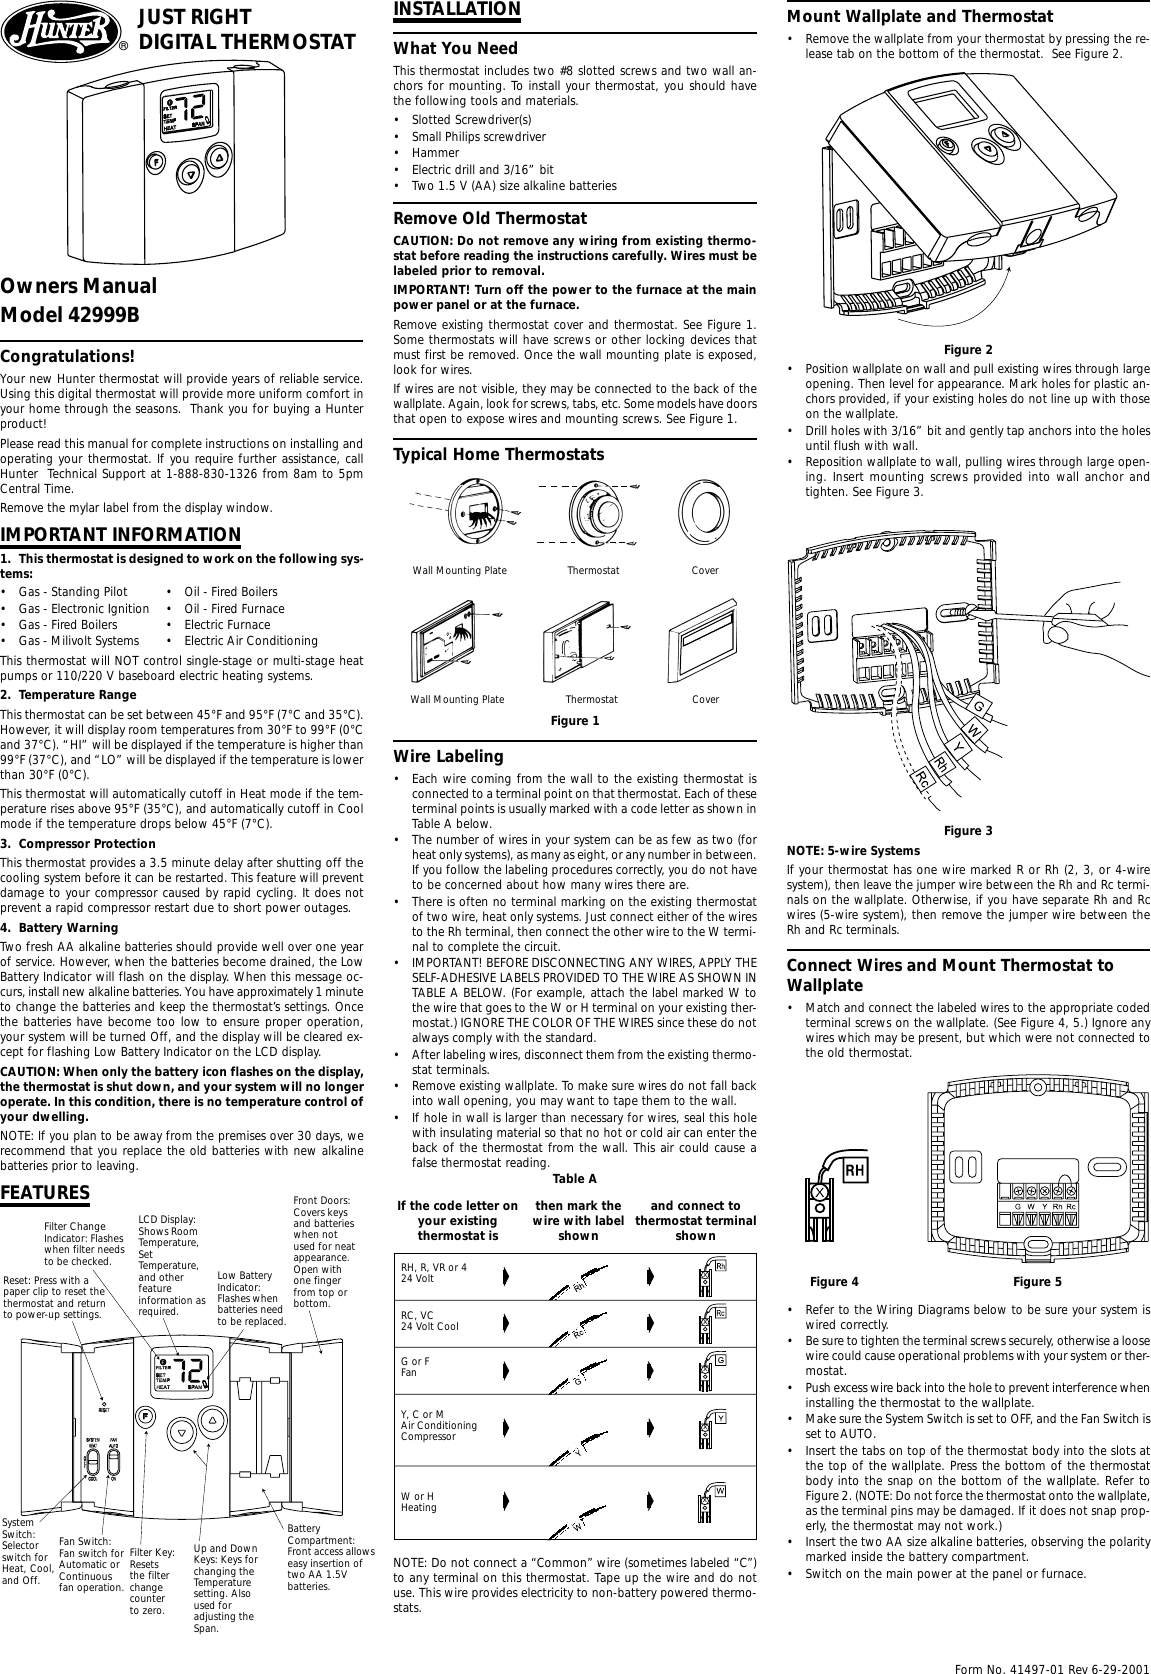 Hunter Thermostat 42999B Wiring Diagram from usermanual.wiki